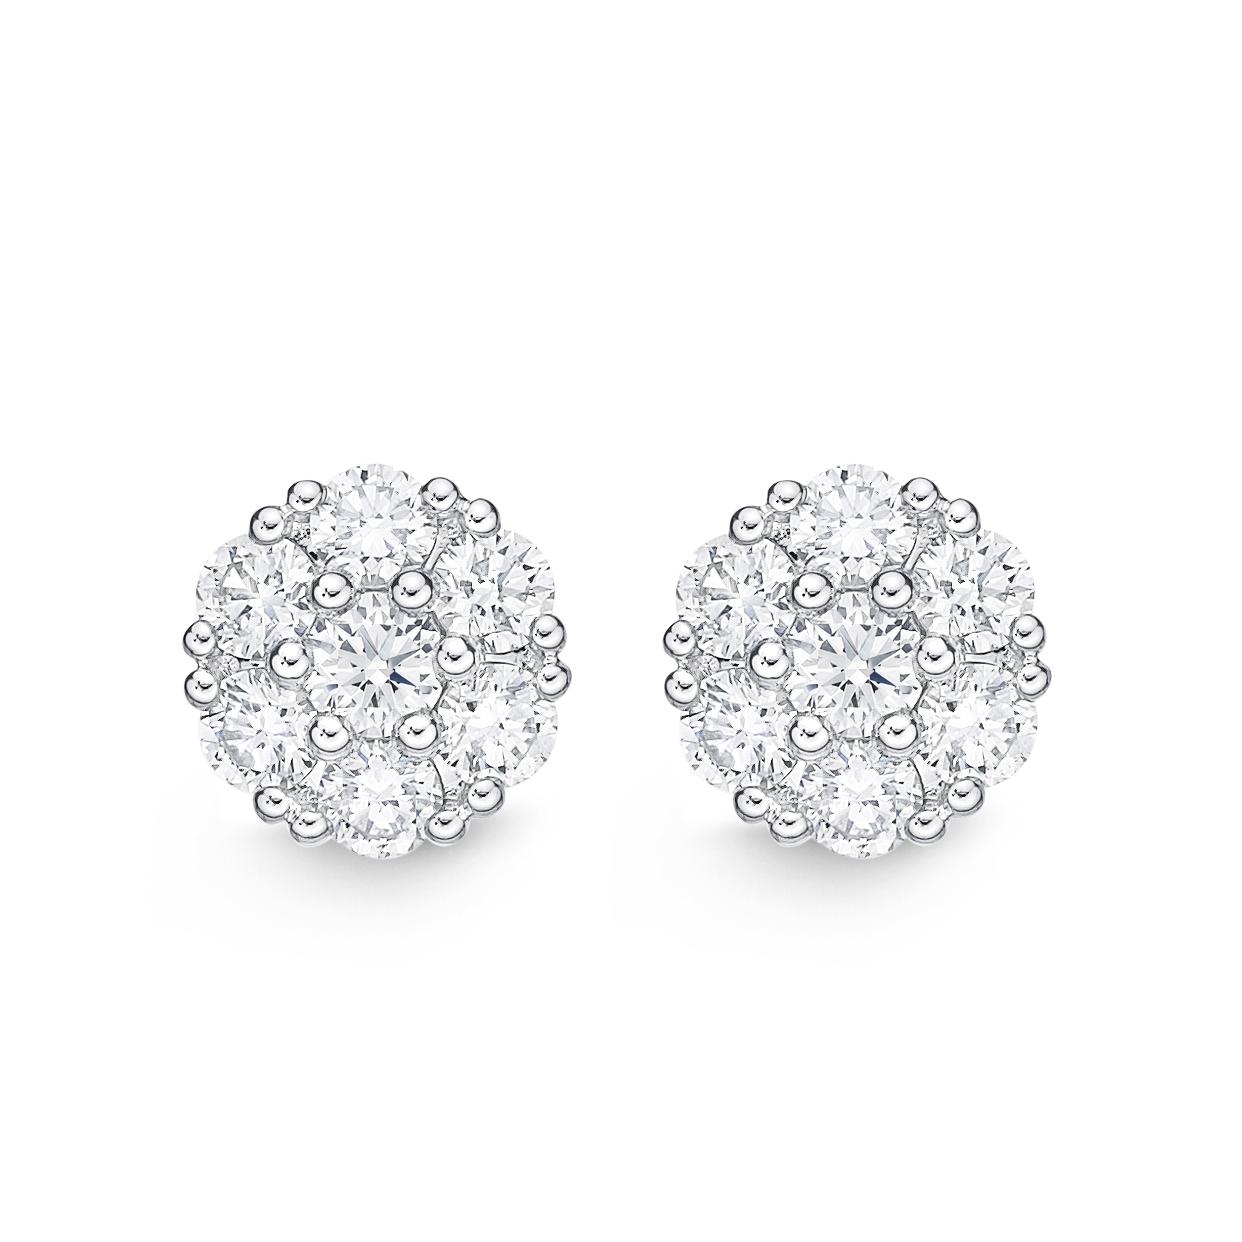 Memoire 18ct White Gold 1 Carat Diamond Floral Style Stud Earrings